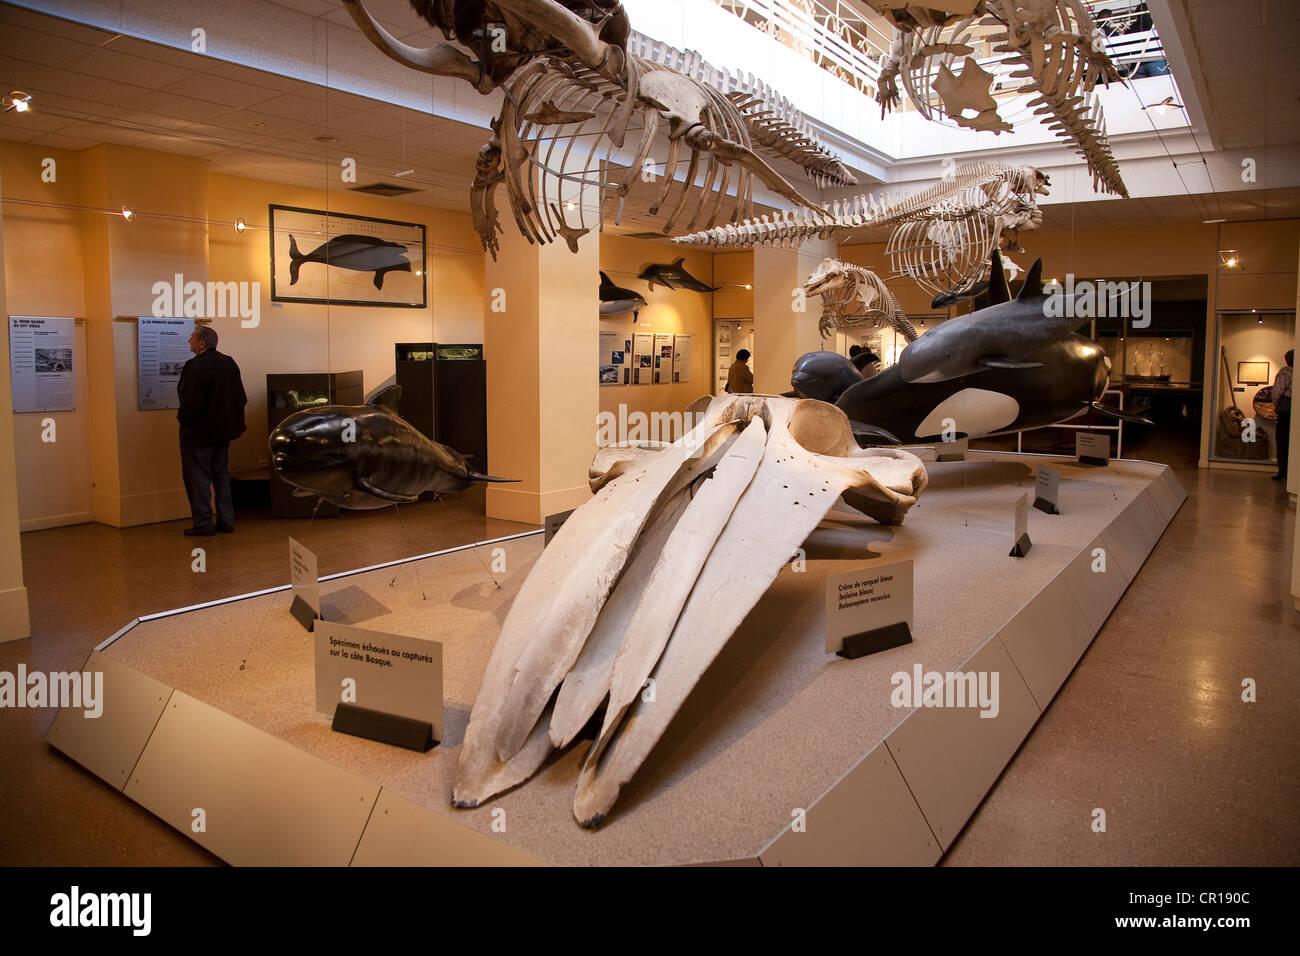 France, Pyrenees Atlantiques, Biarritz, Musee de la Mer (Maritime Museum), cetacean's skeleton - Stock Image